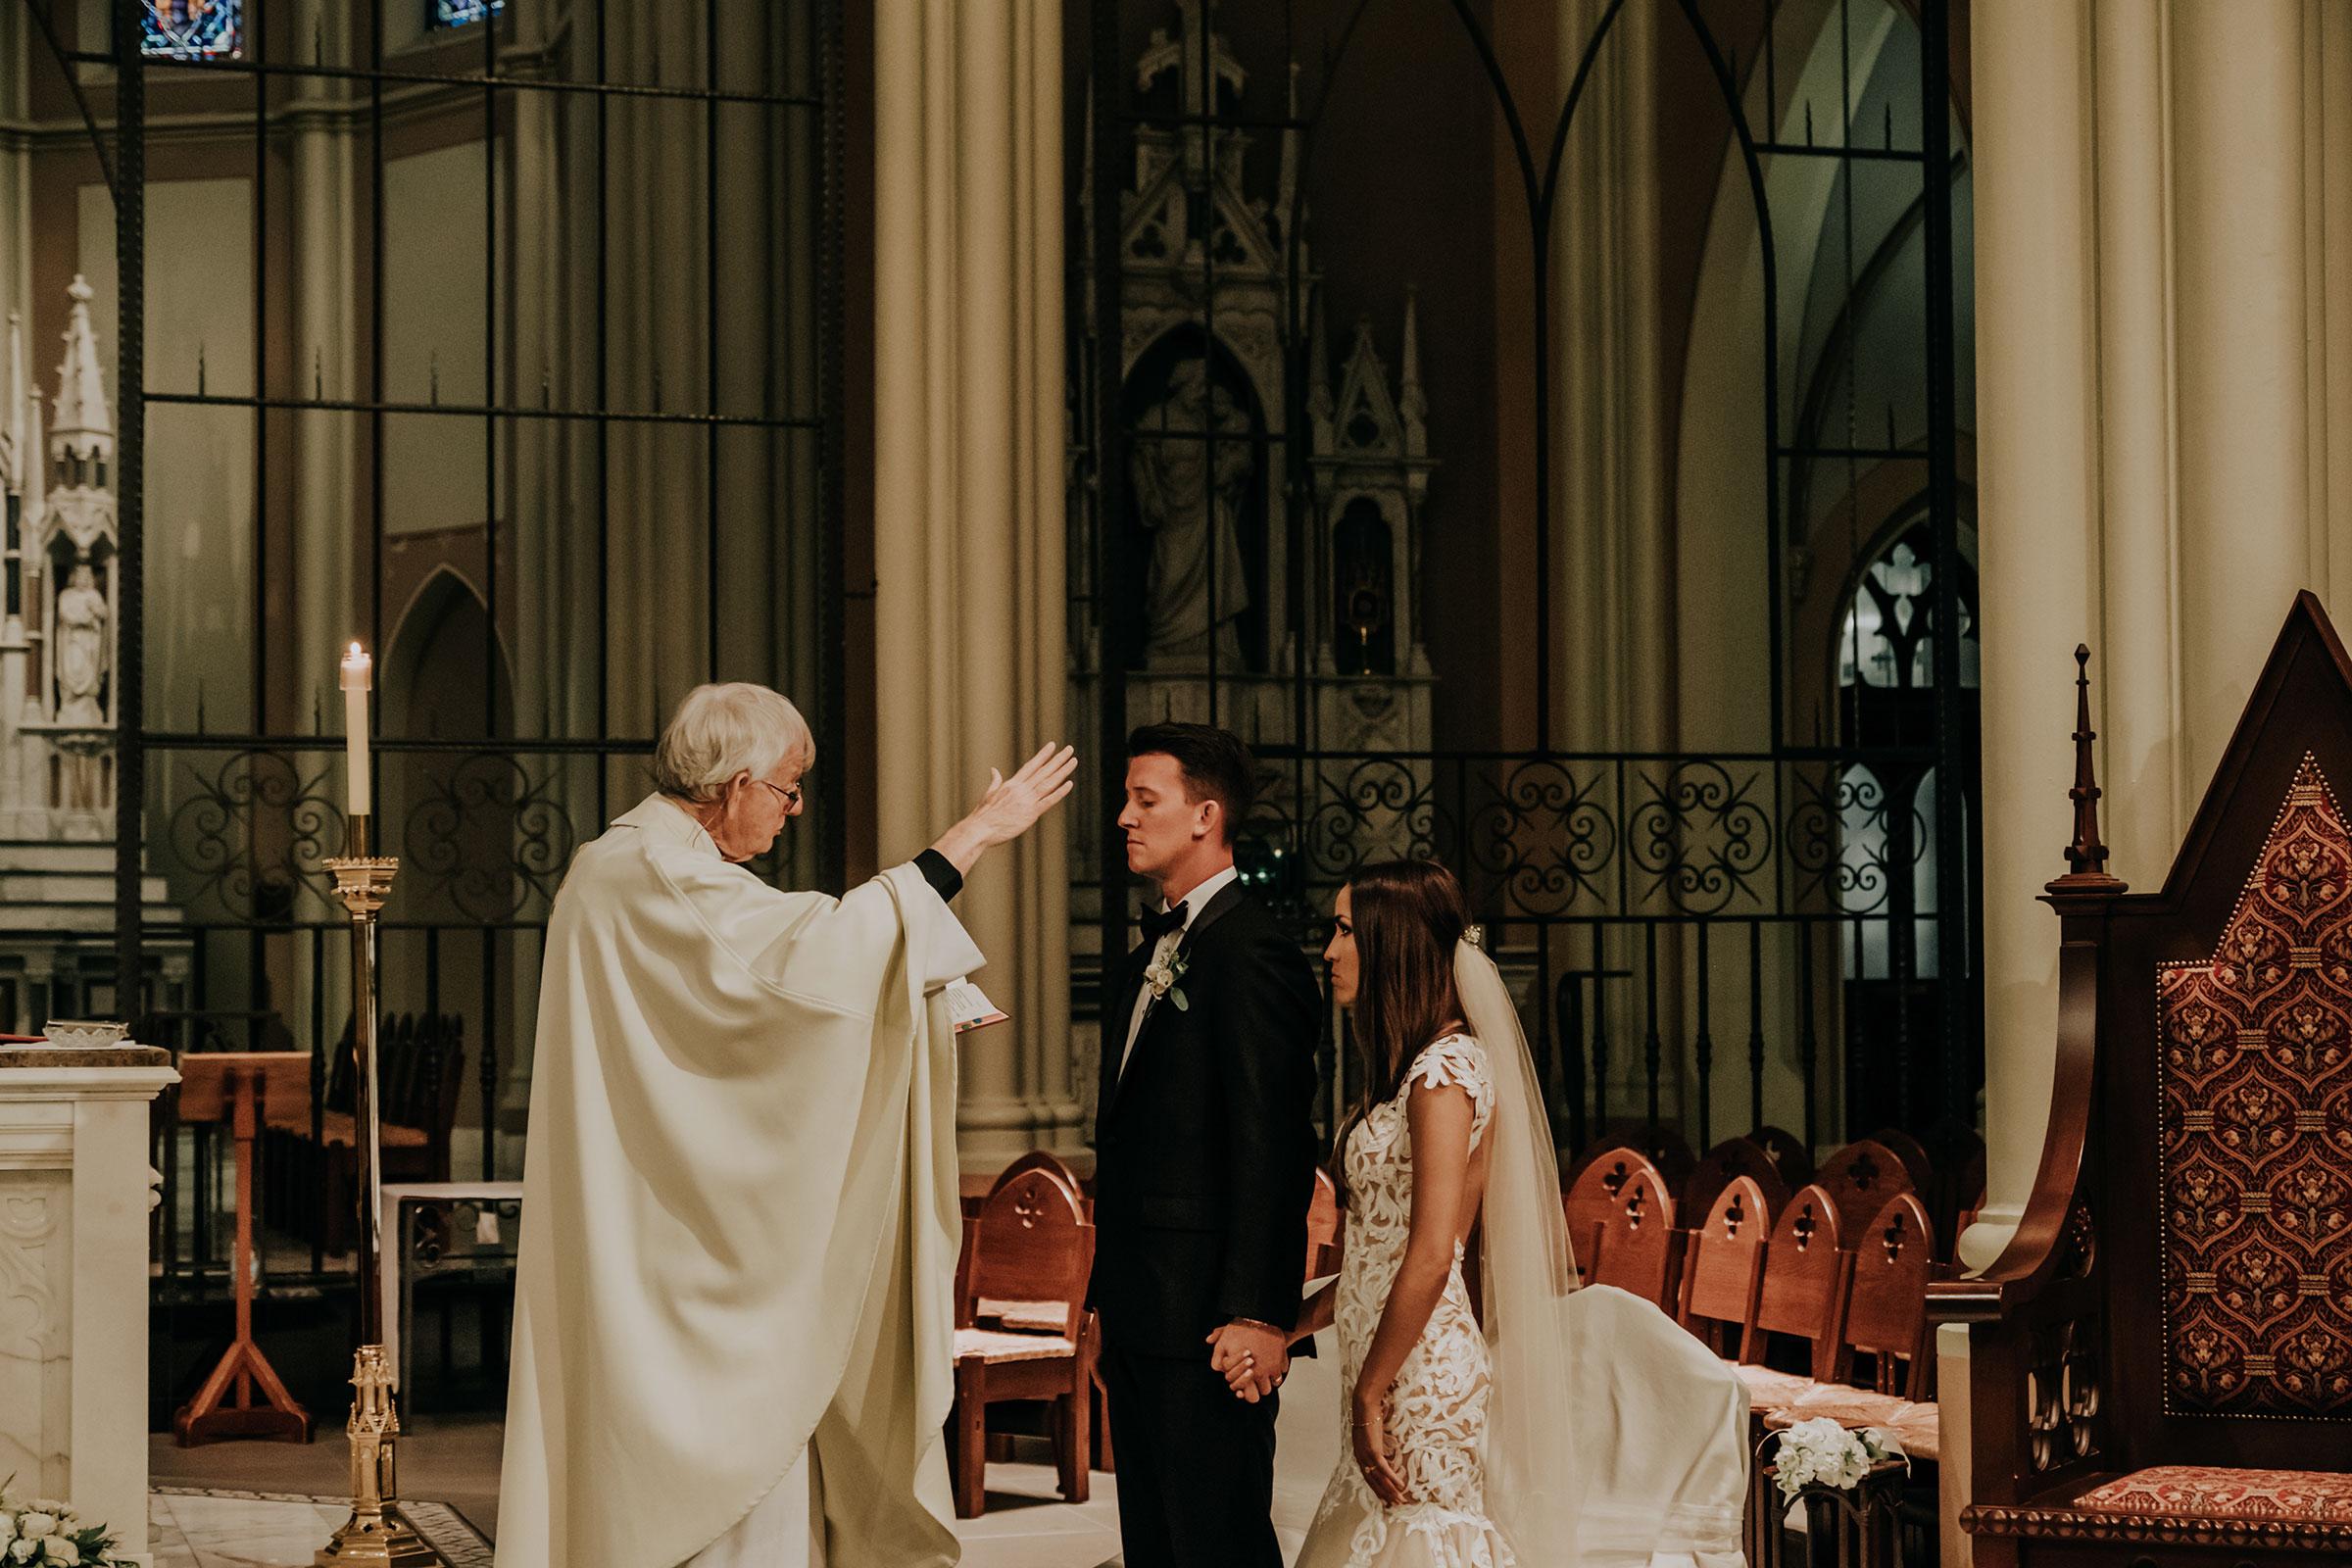 bride-groom-being-blessed-at-ceremony-st-johns-church-at-creighton-omaha-nebraska-raelyn-ramey-photography.jpg